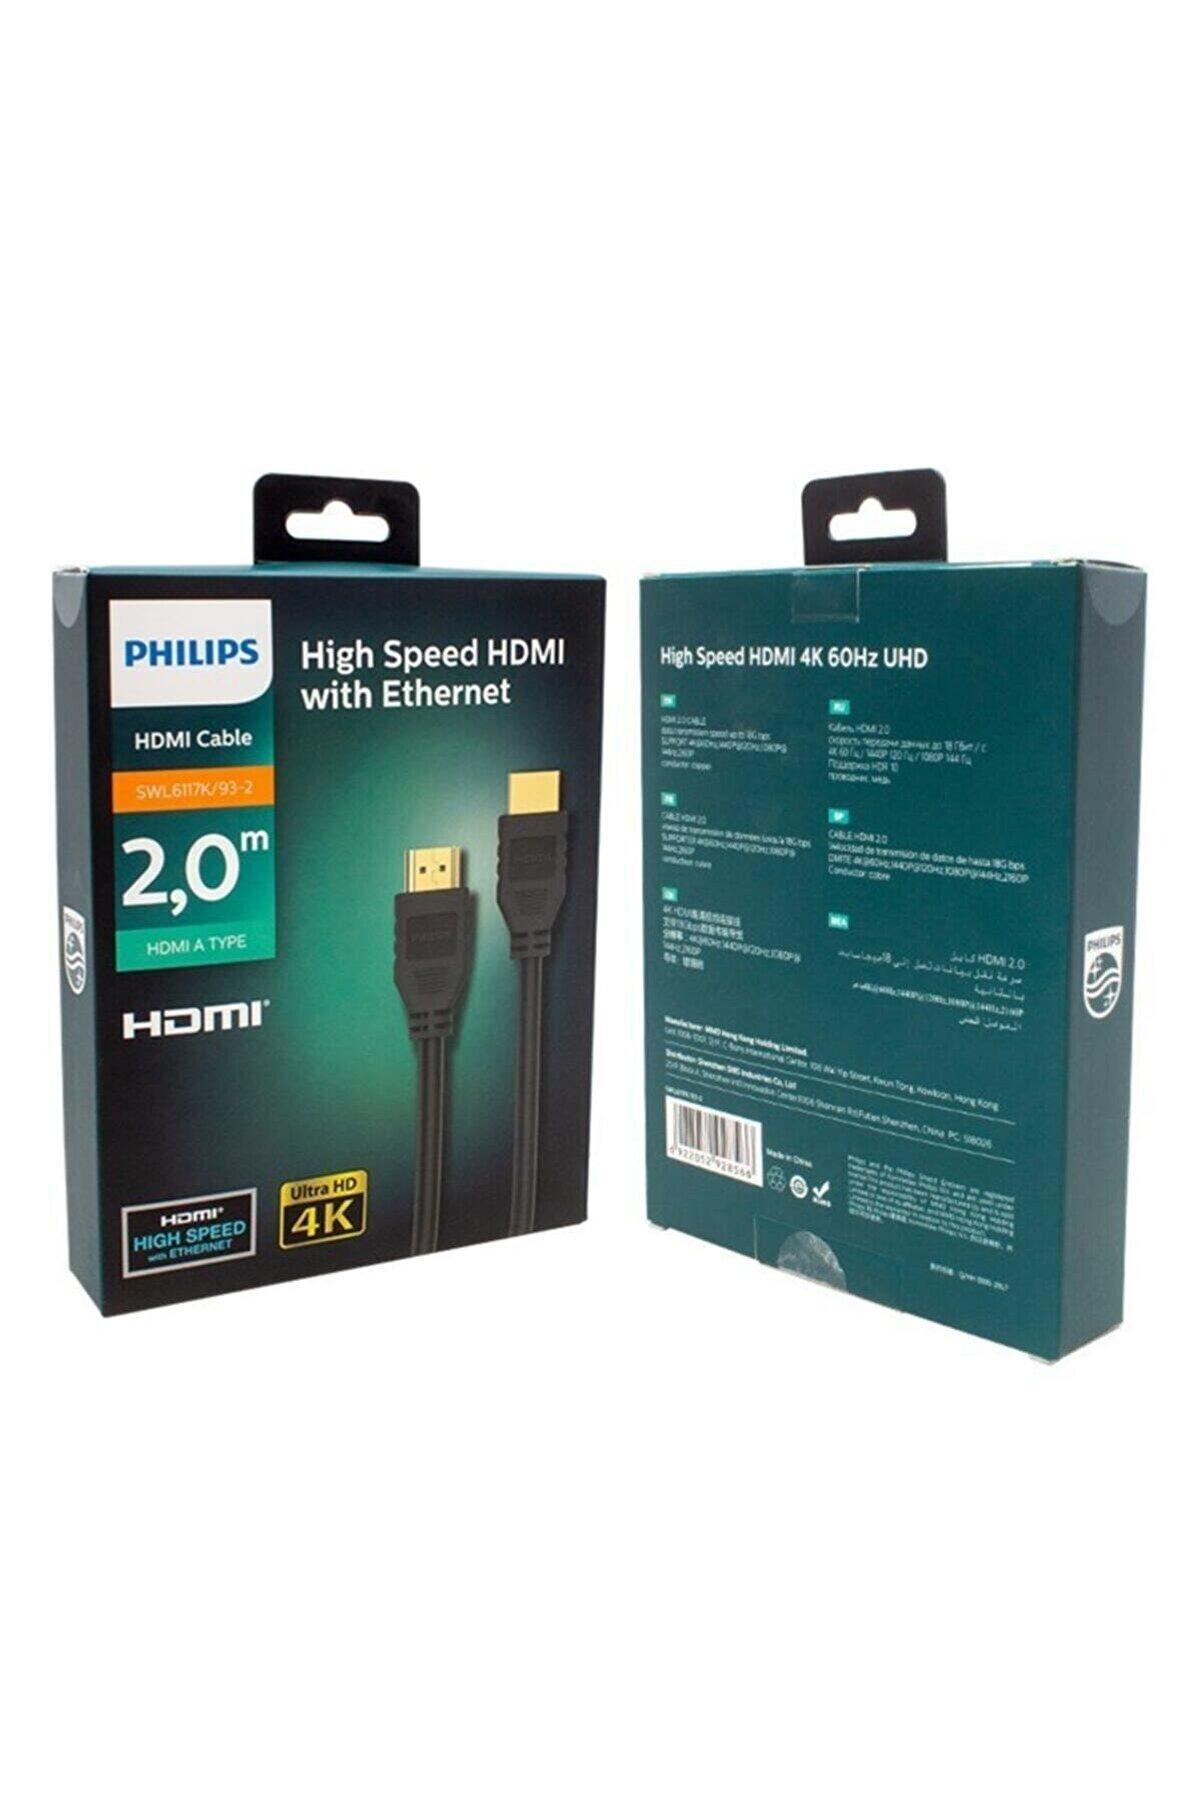 Philips 2 Metre Hdmı Kablo Altın Uçlu 4k Ultra High Speed With Ethernet Hd Kablo Swl6117k/93-2